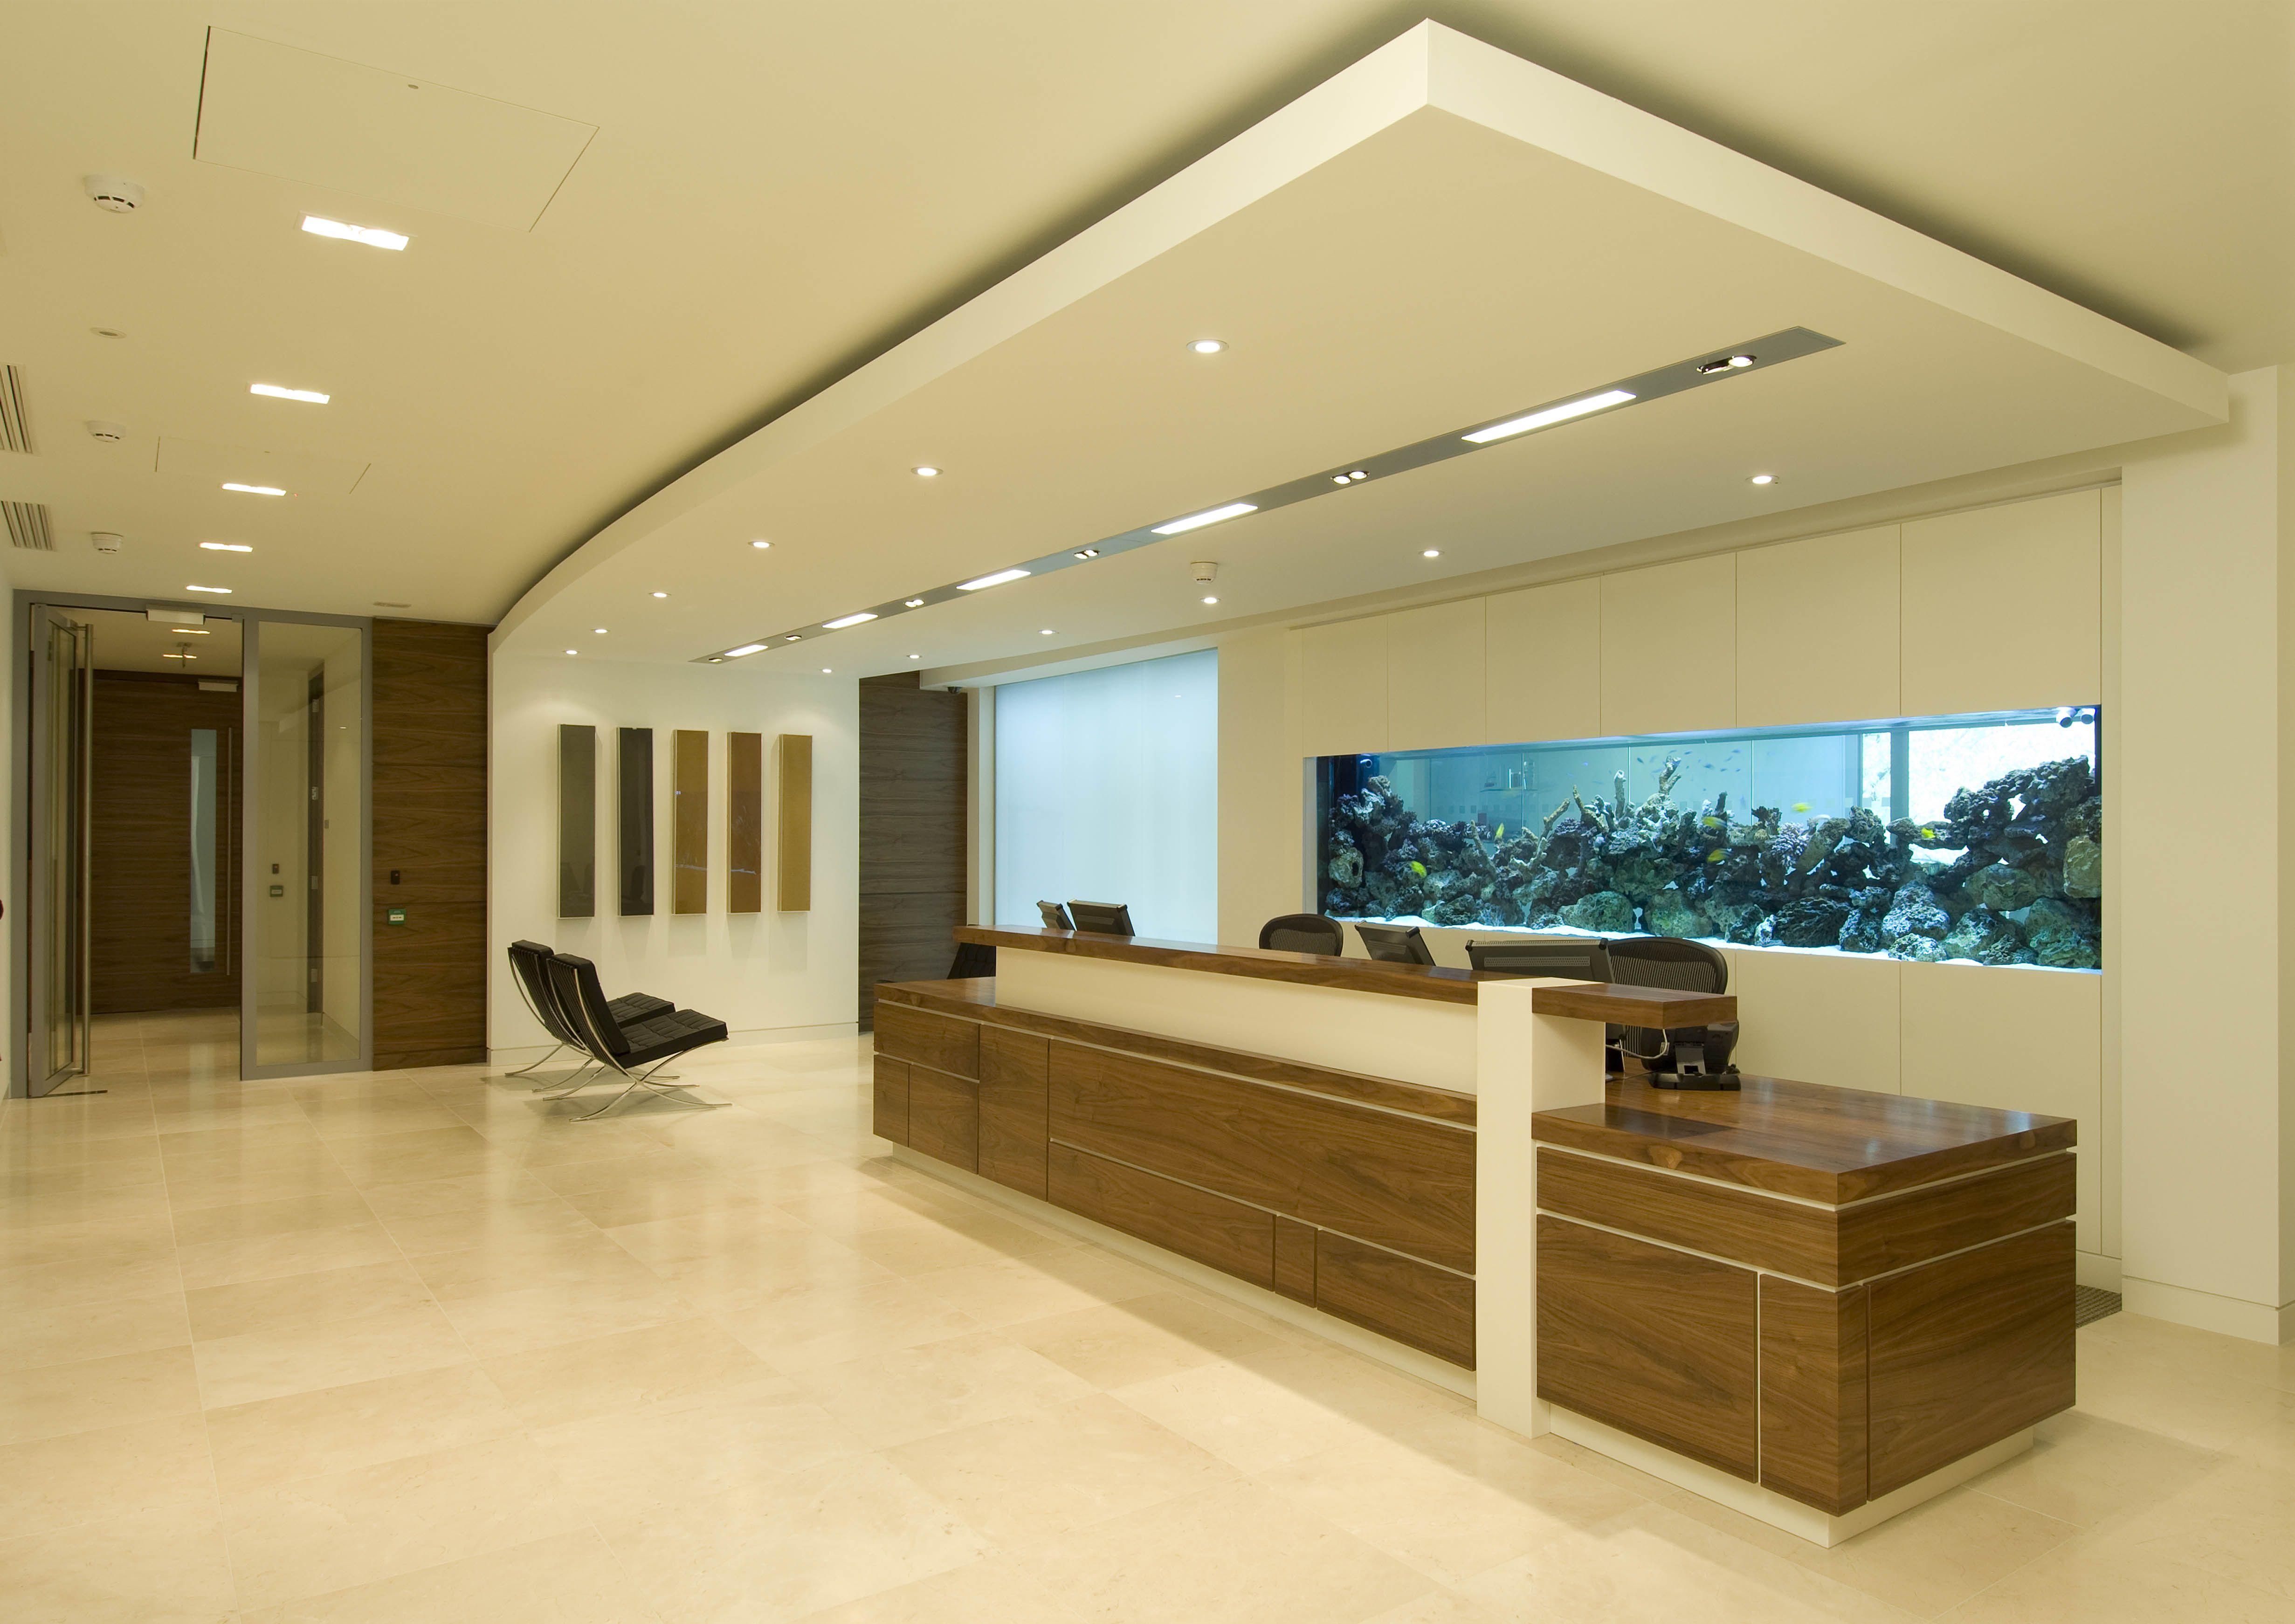 special general council reception - HD4923×3484